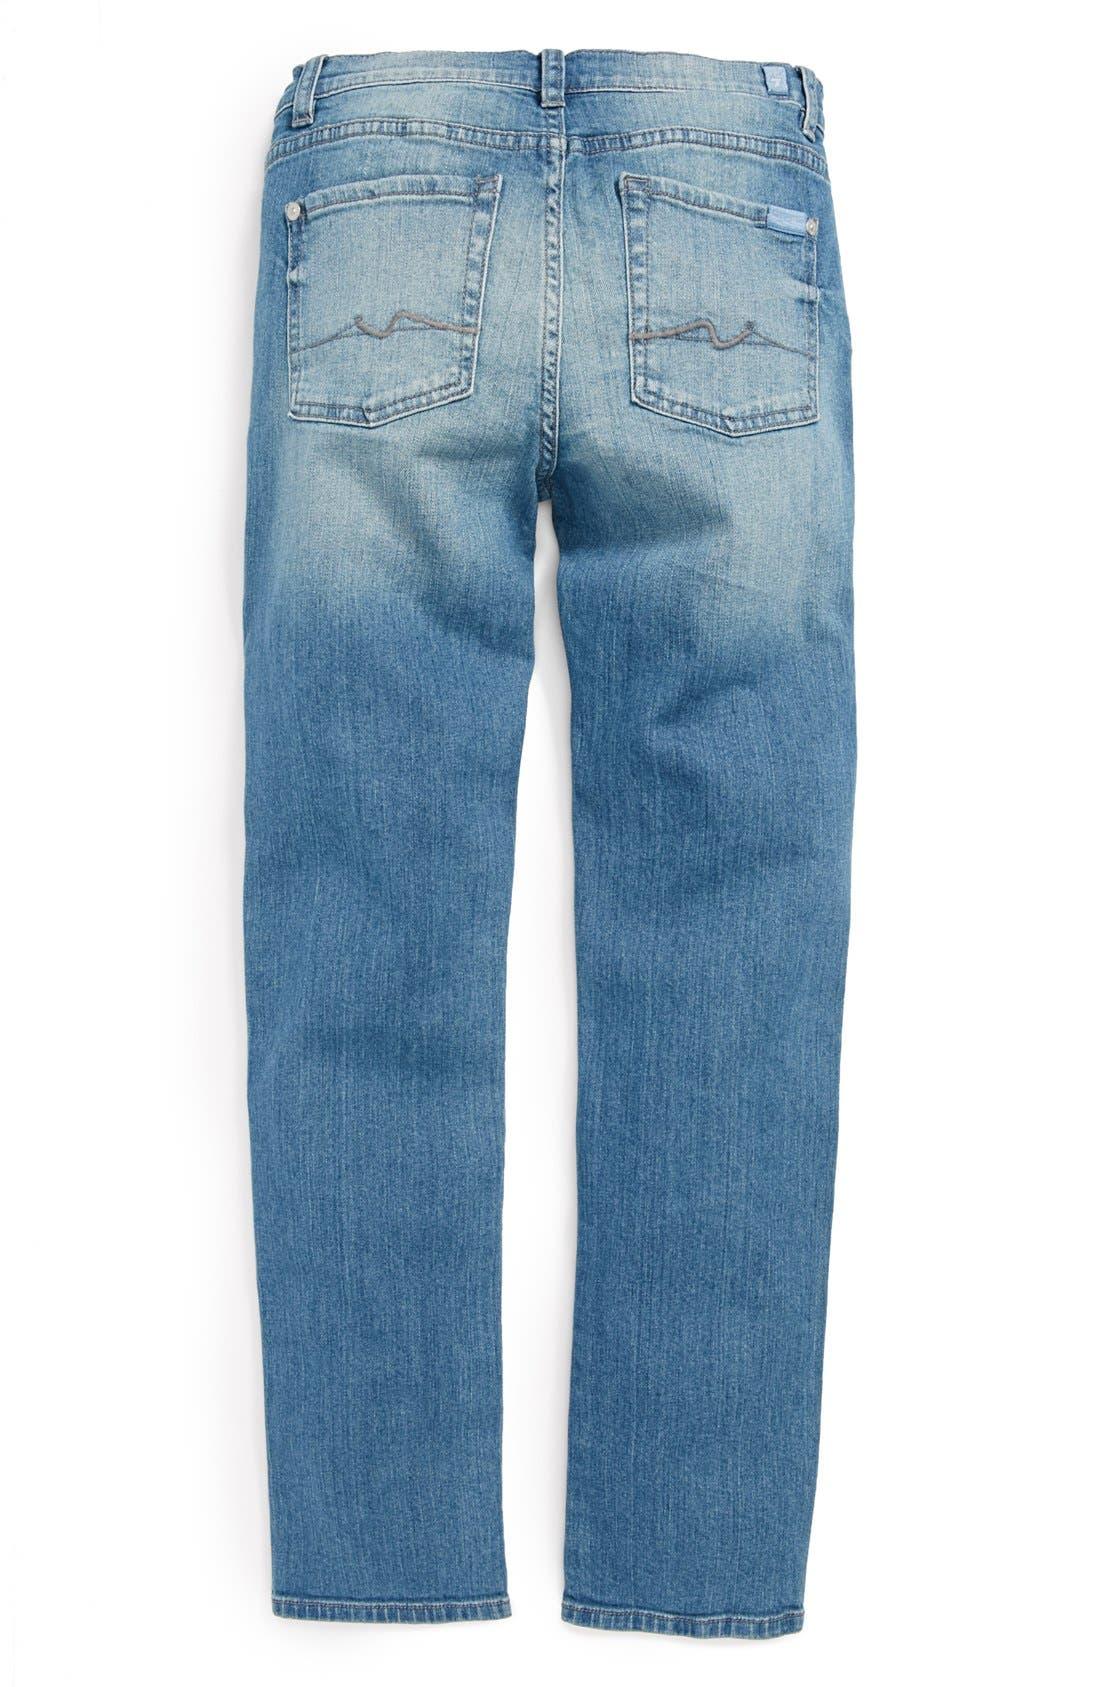 Alternate Image 1 Selected - 7 For All Mankind® 'Slimmy' Slim Fit Jeans (Big Boys)